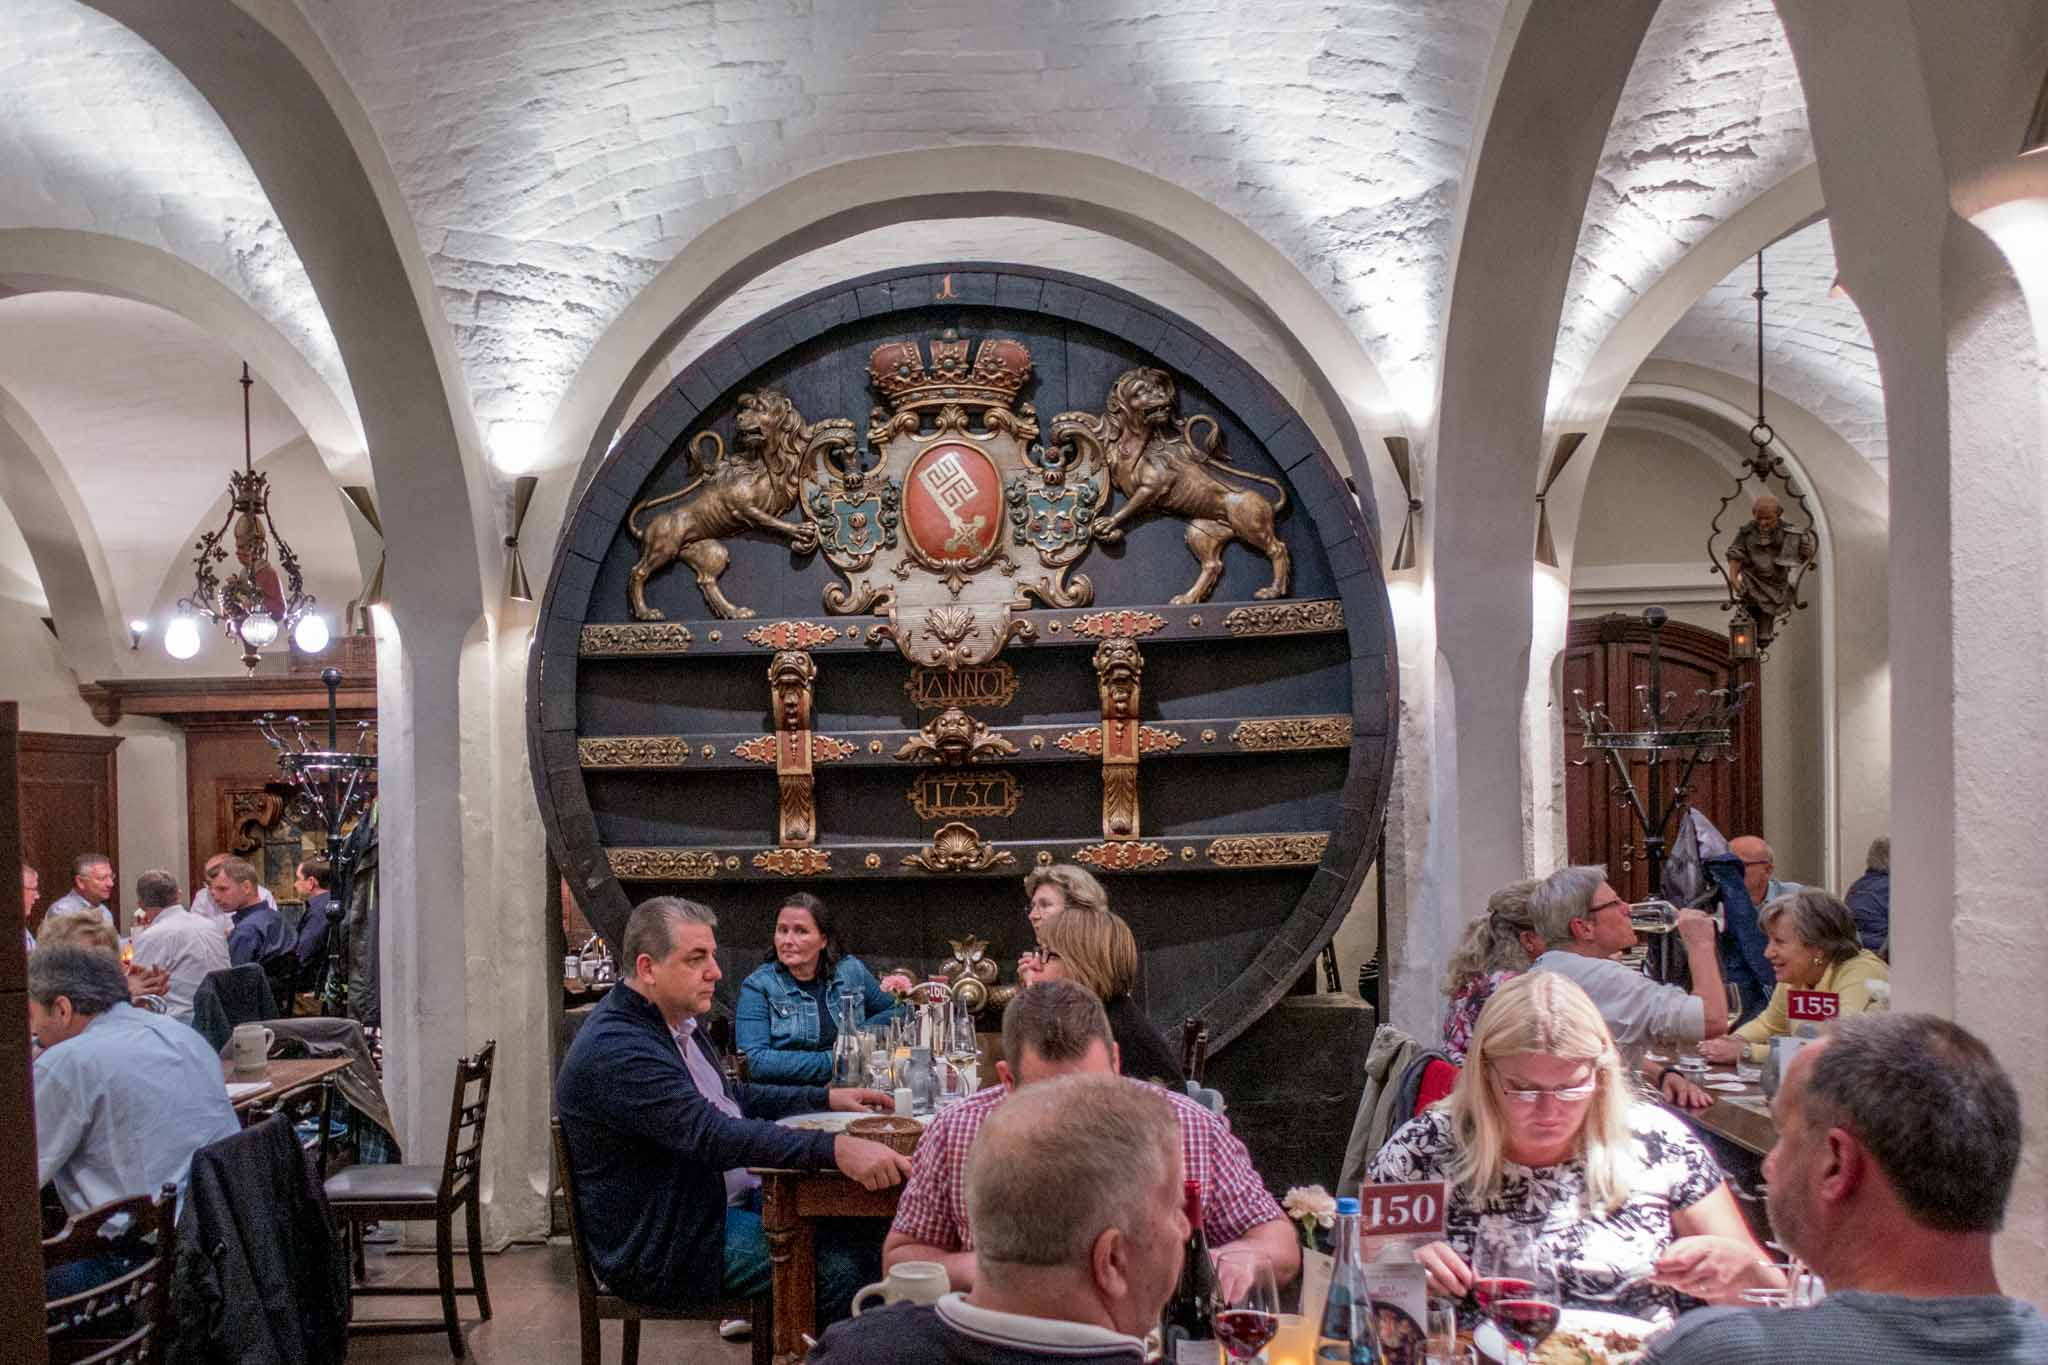 People eating in the Bremer Ratskeller restaurant